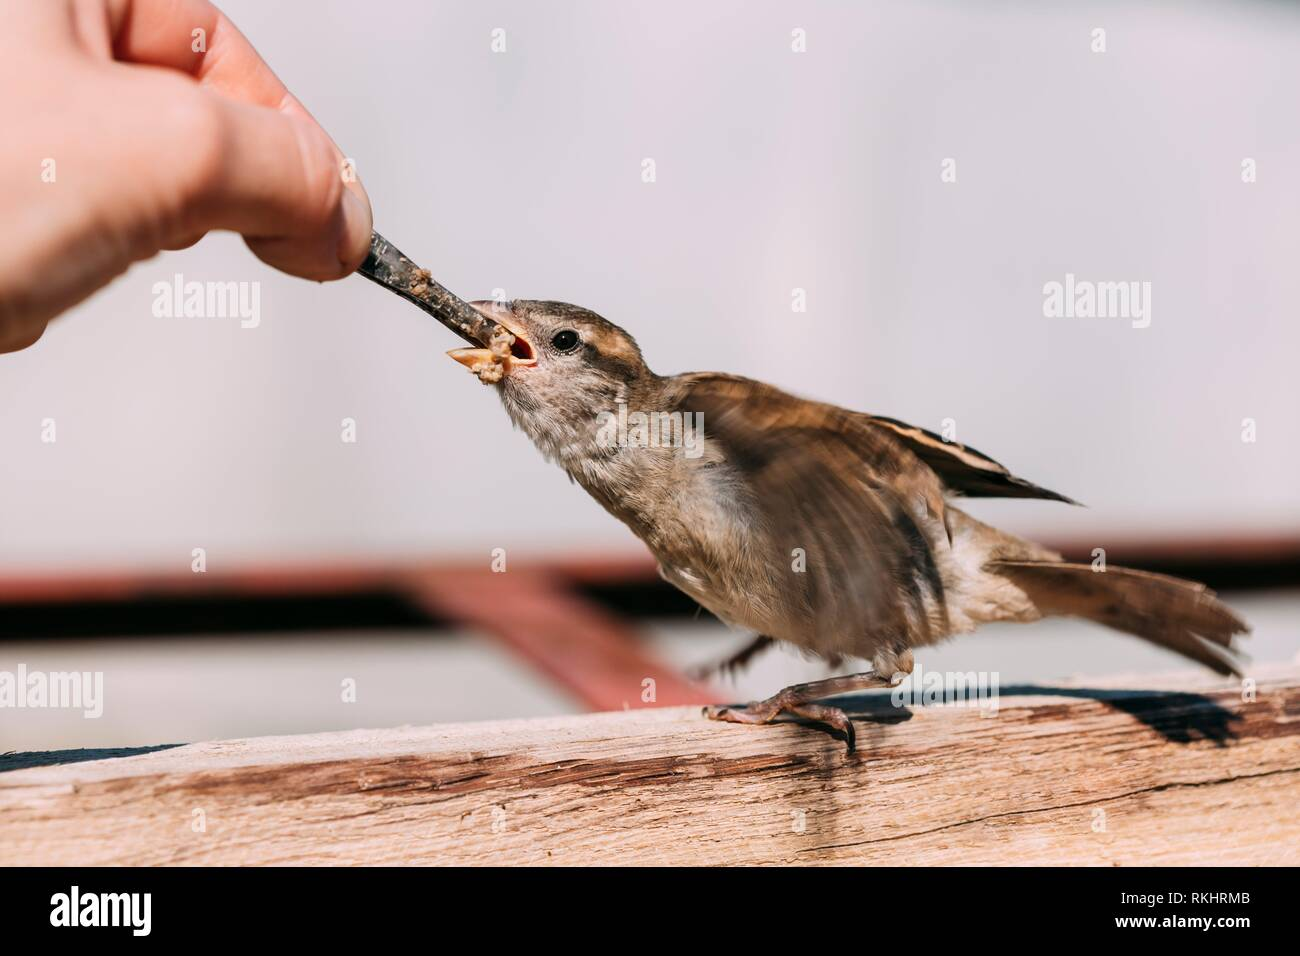 Alimentación de la joven chica, pájaro Gorrión Yellow-Beaked Passer domesticus. Foto de stock